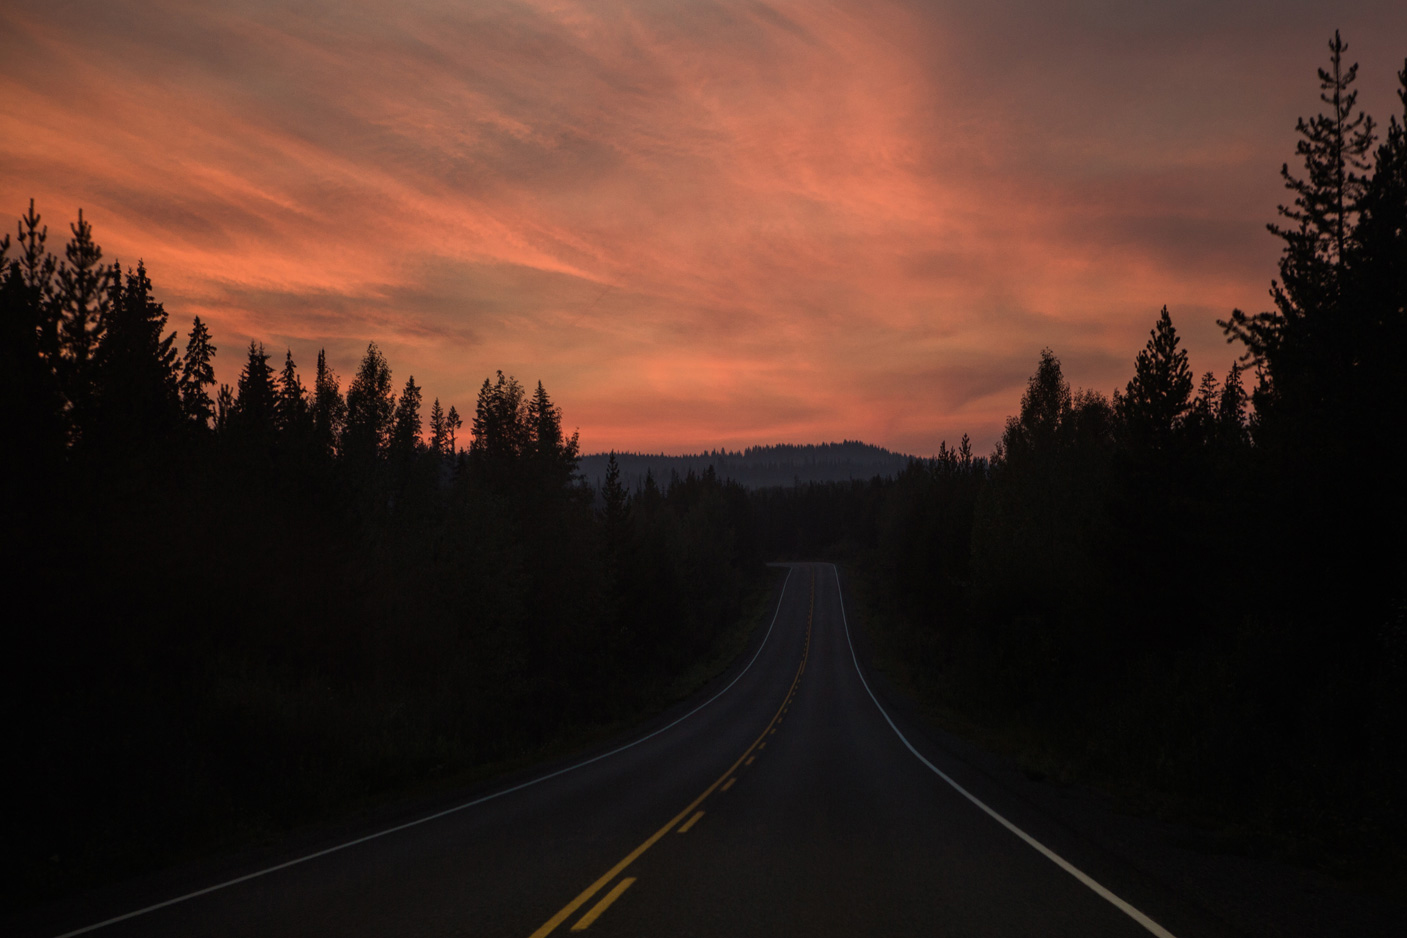 CindyGiovagnoli_BritishColumbia_Yukon_Alaska_roadtrip_AlCan_Alaskan_Highway_truck_camping-007.jpg